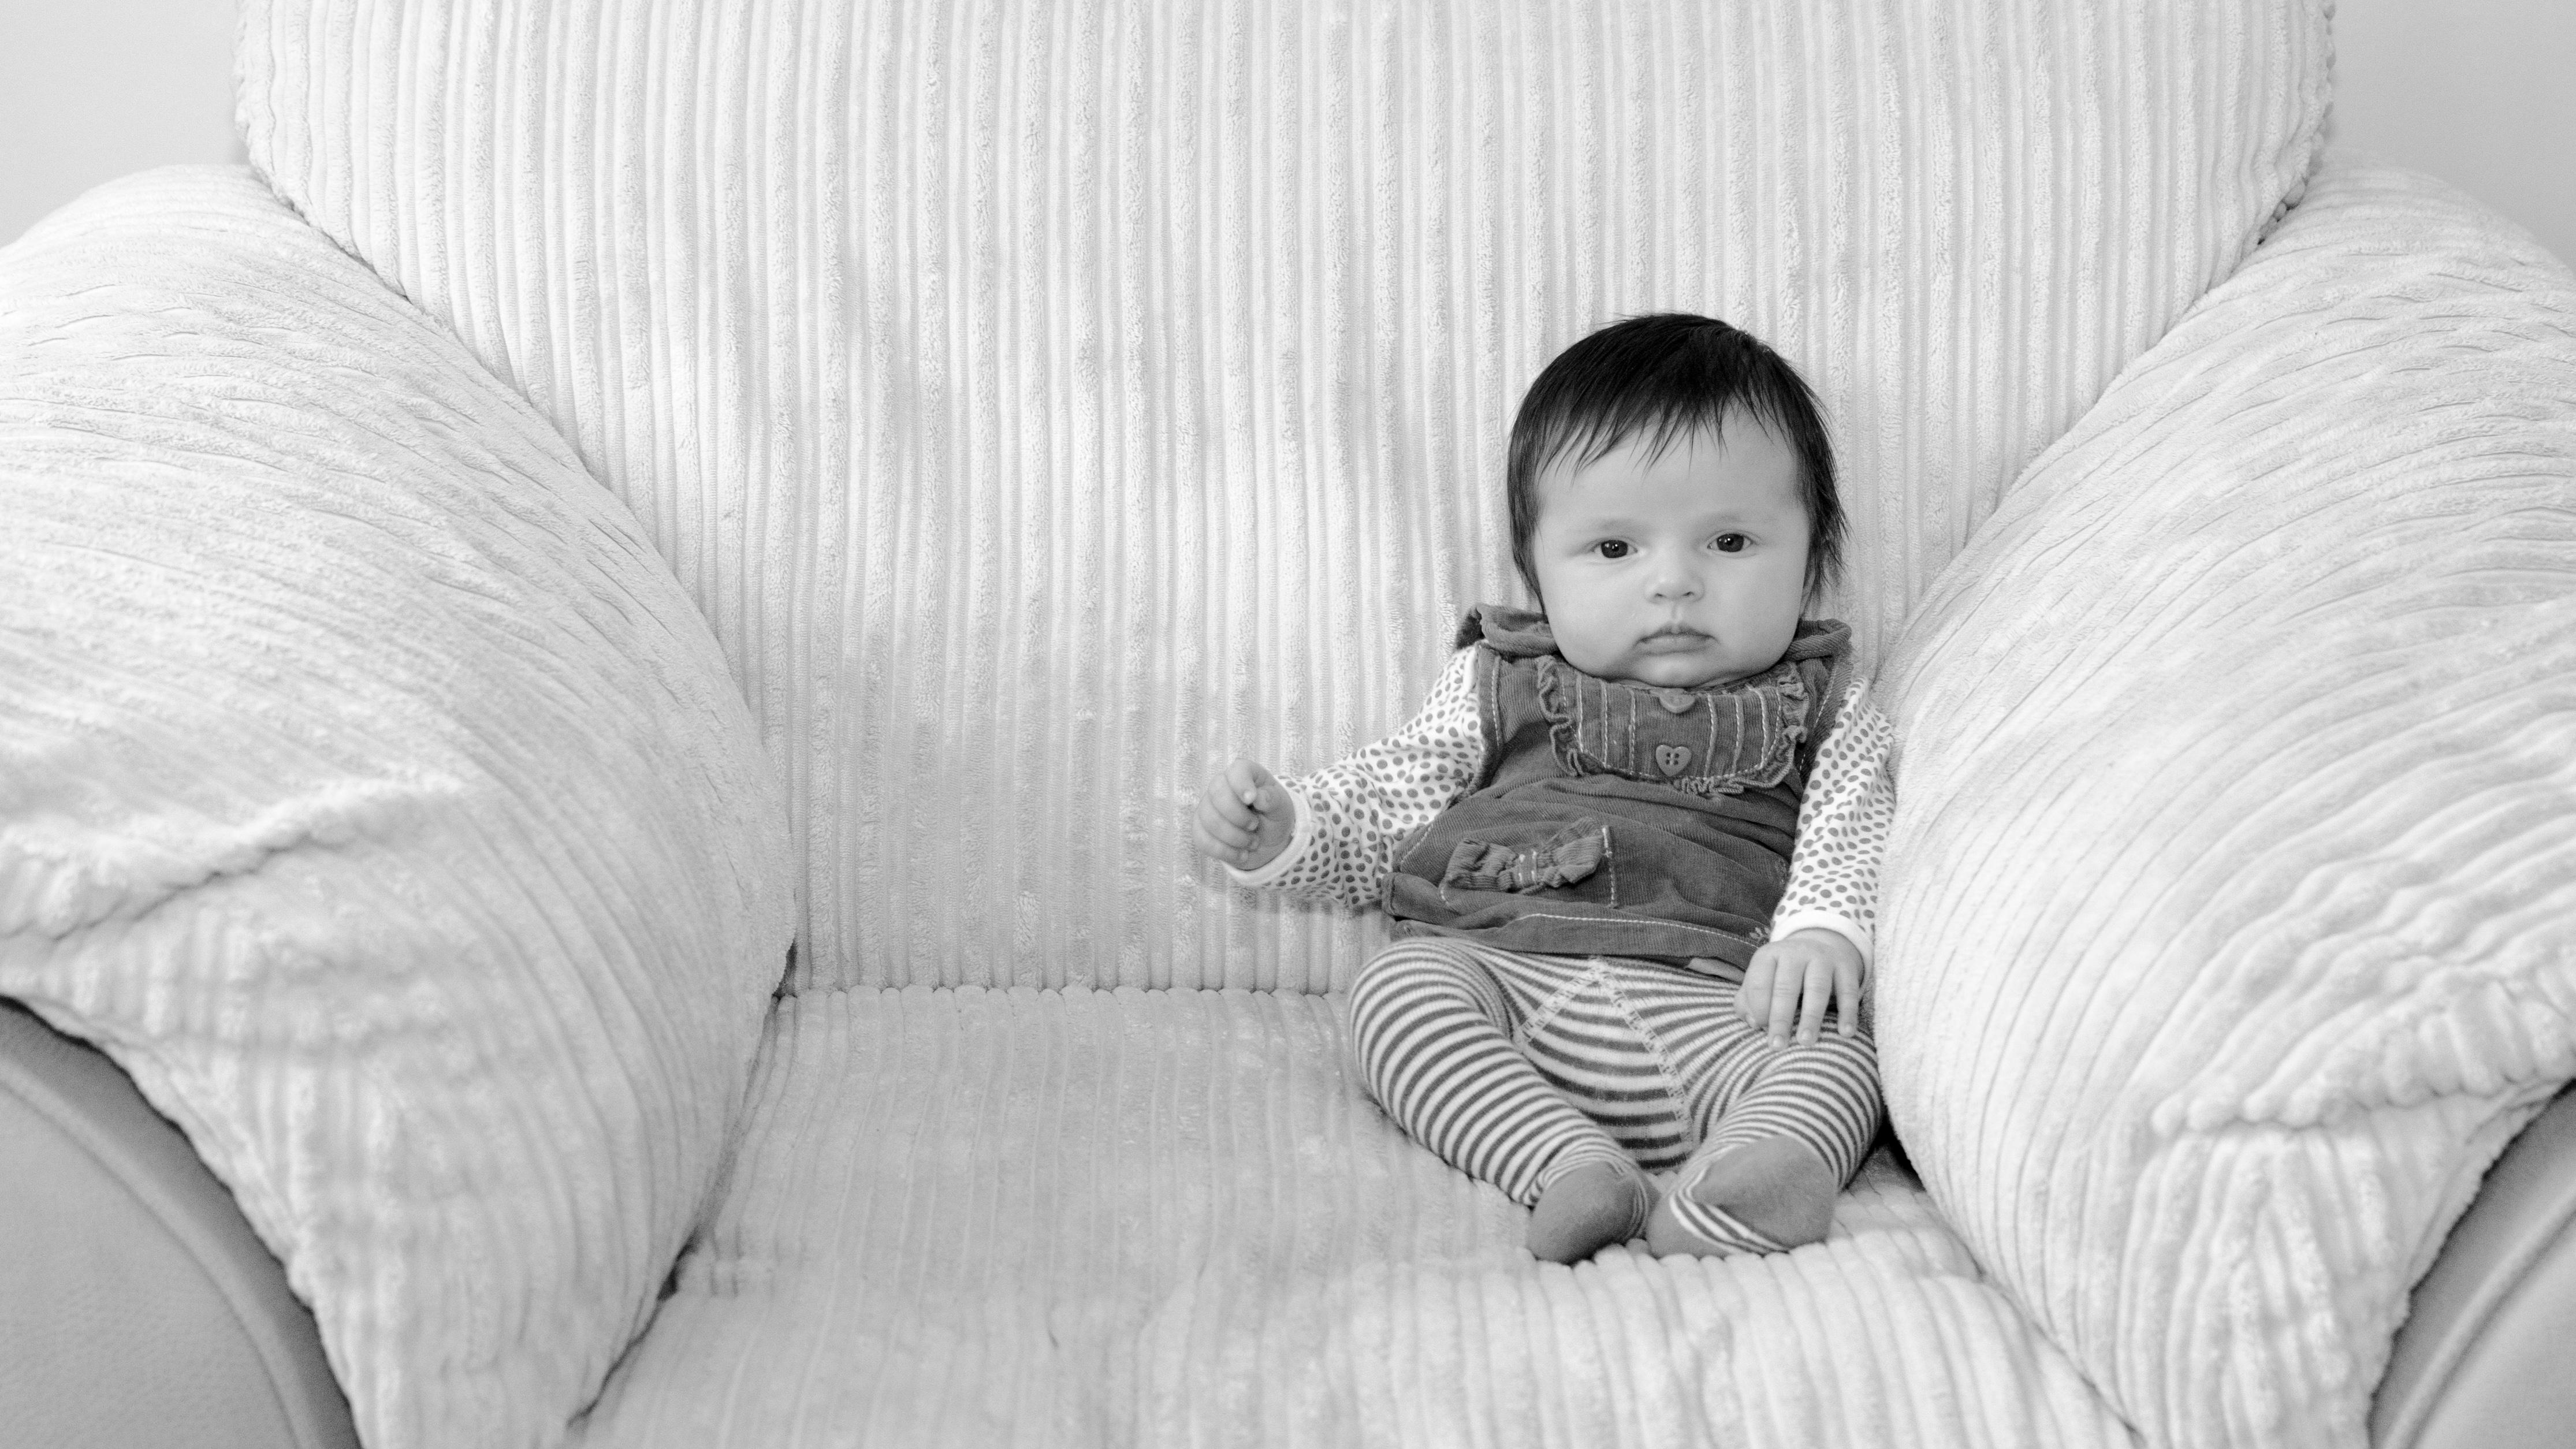 Fondos de pantalla : monocromo, sentado, cama, fotografía, silla ...